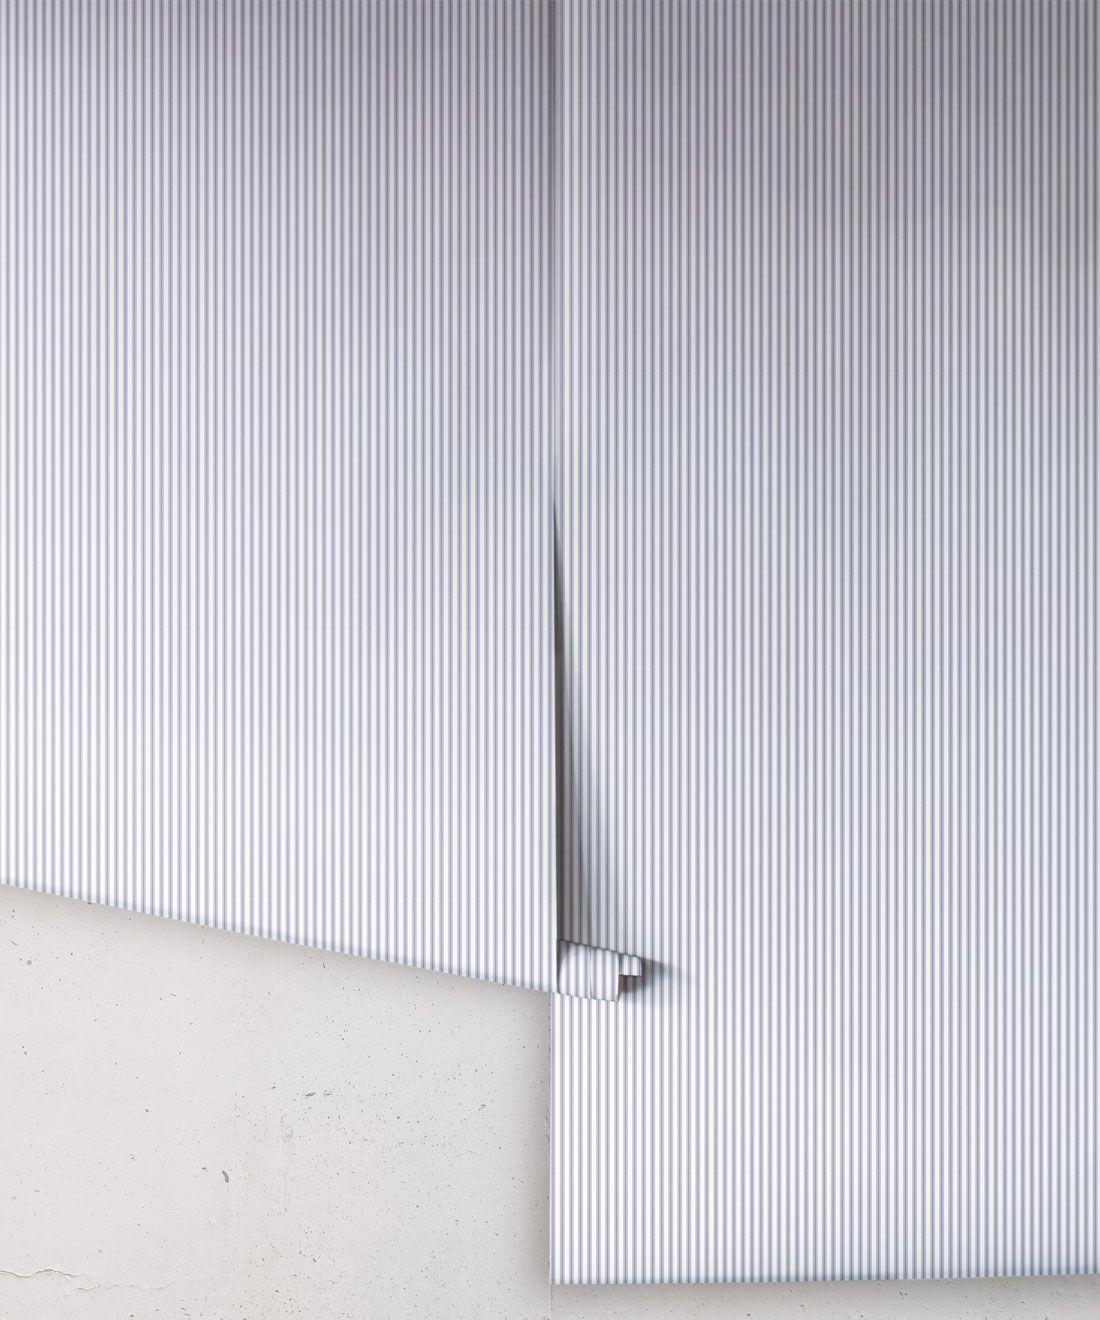 Ticking Stripe Wallpaper • Navy Wallpaper • Rolls